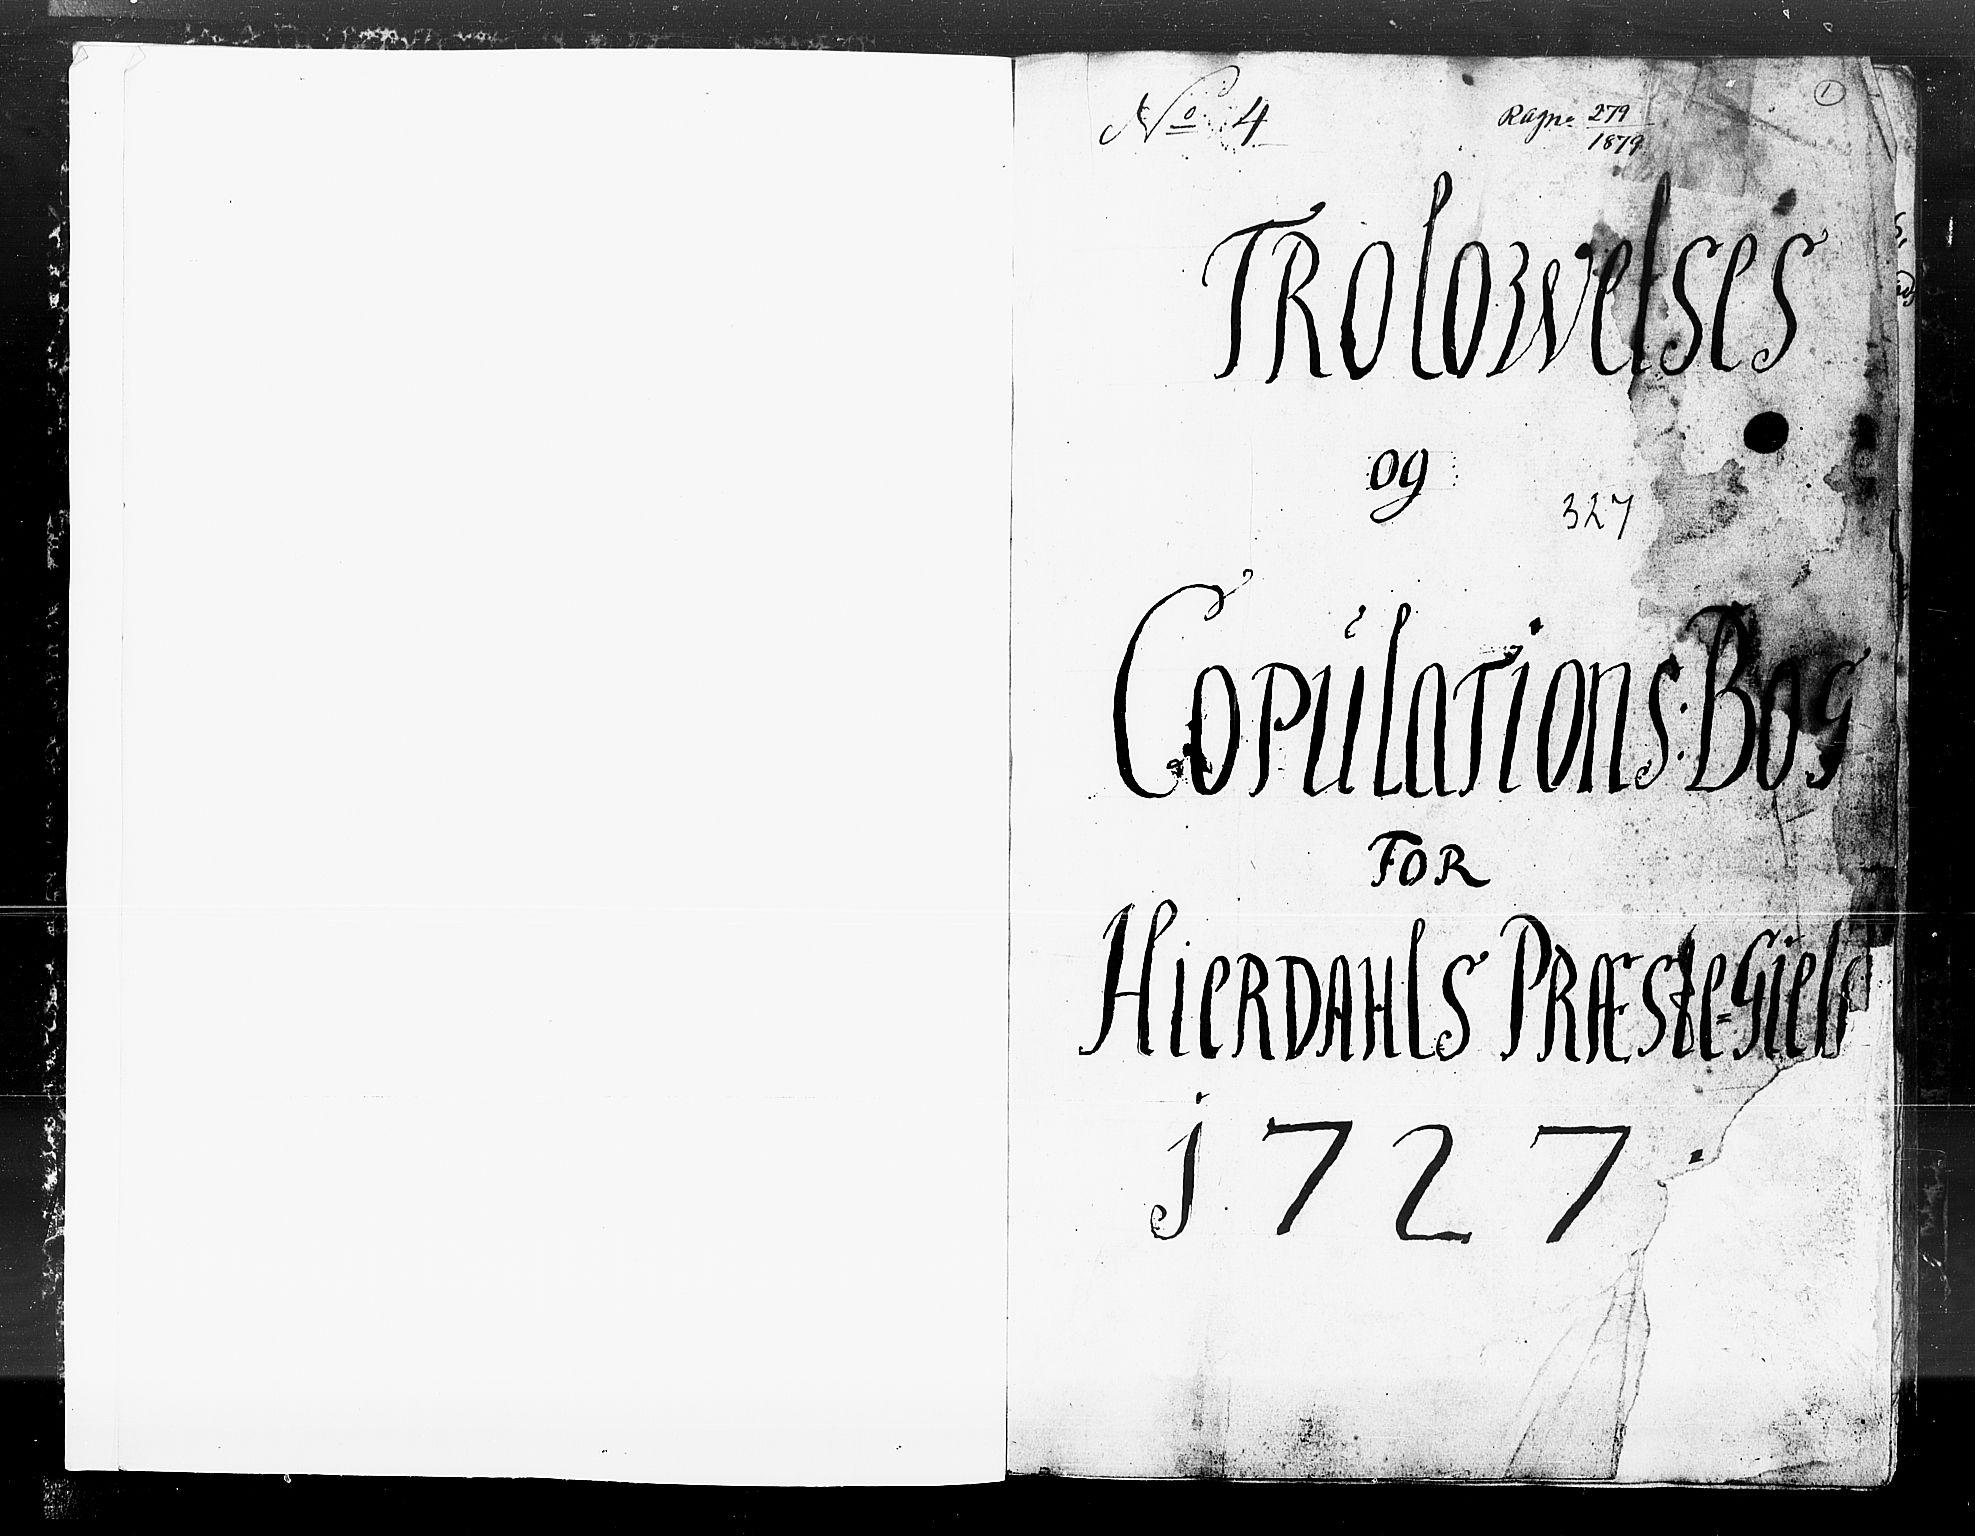 SAKO, Hjartdal kirkebøker, F/Fa/L0004: Ministerialbok nr. I 4, 1727-1795, s. 1